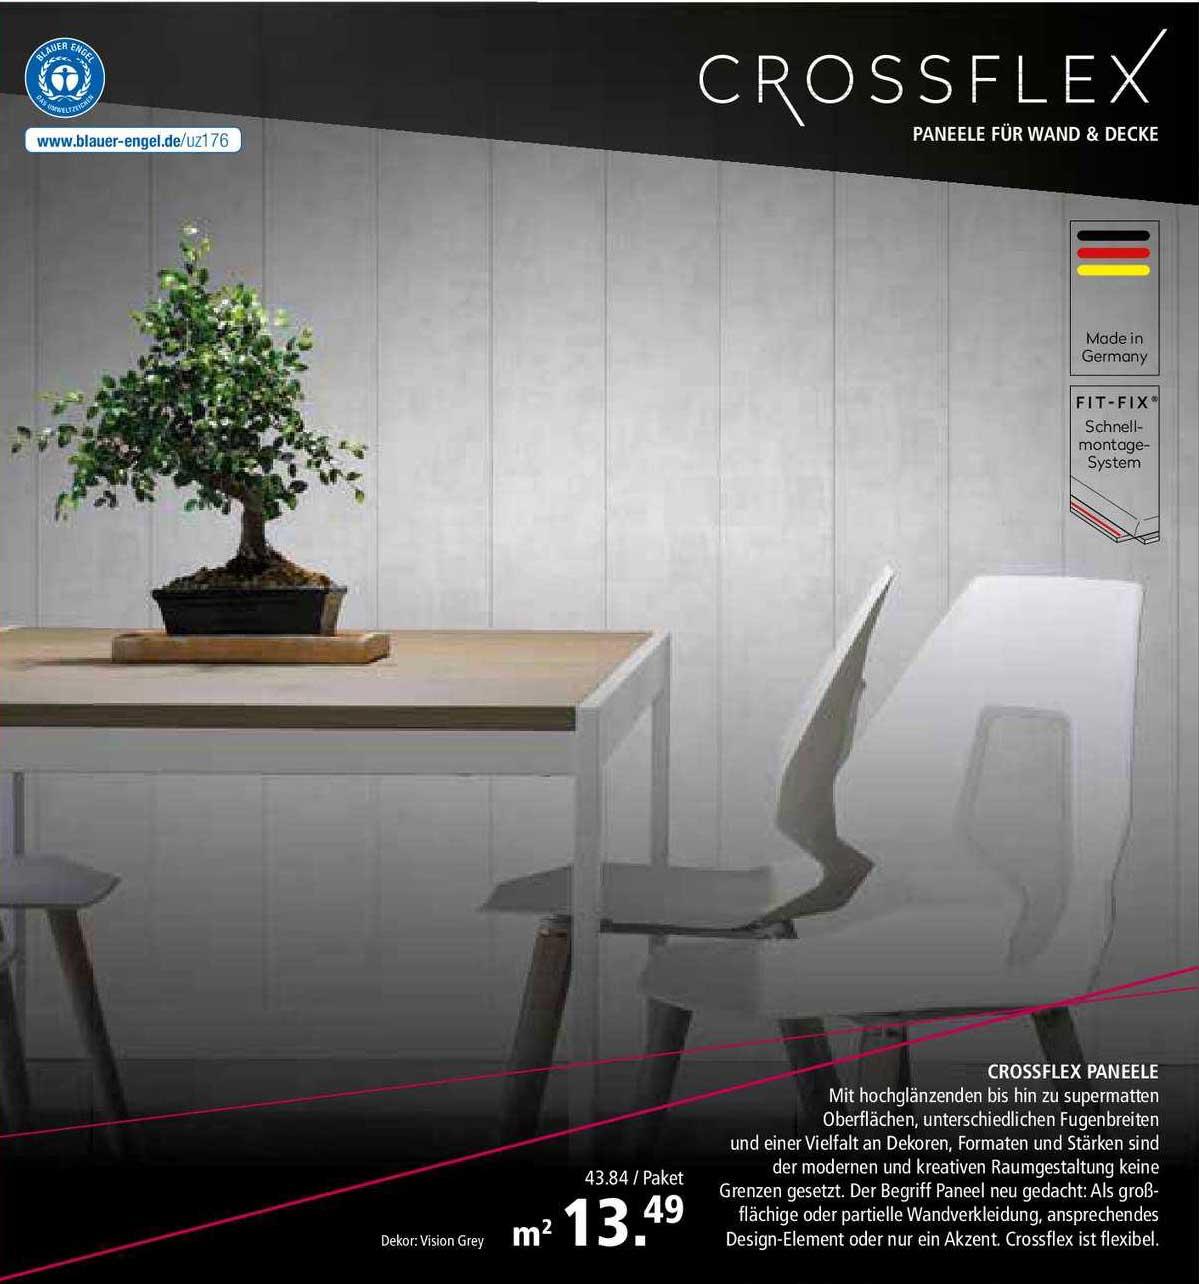 BauSpezi Crossflex Paneele